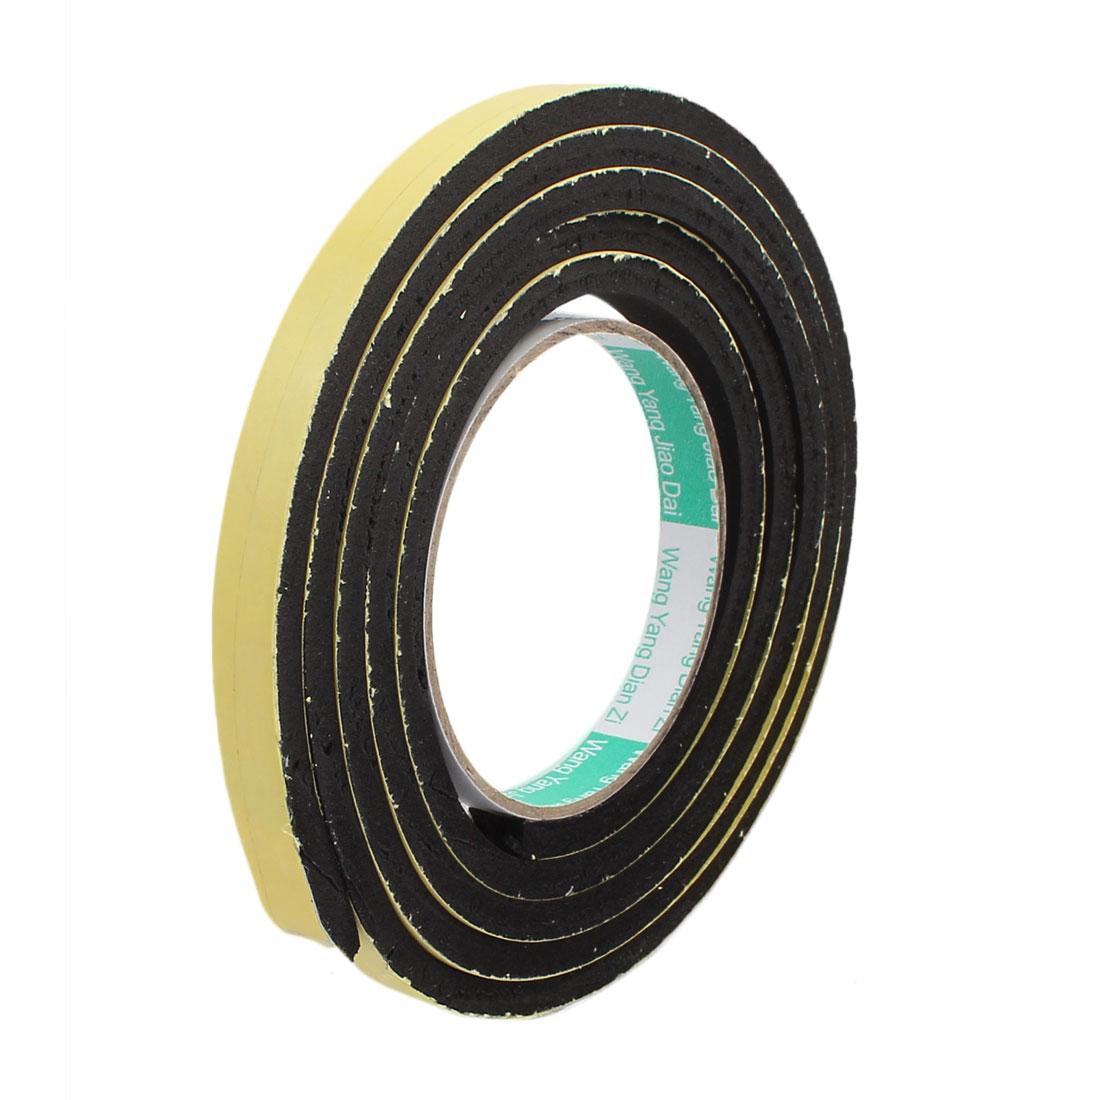 1.2cm Width 2m Length 6mm Thick Single Sided Sealing Shockproof Sponge Tape